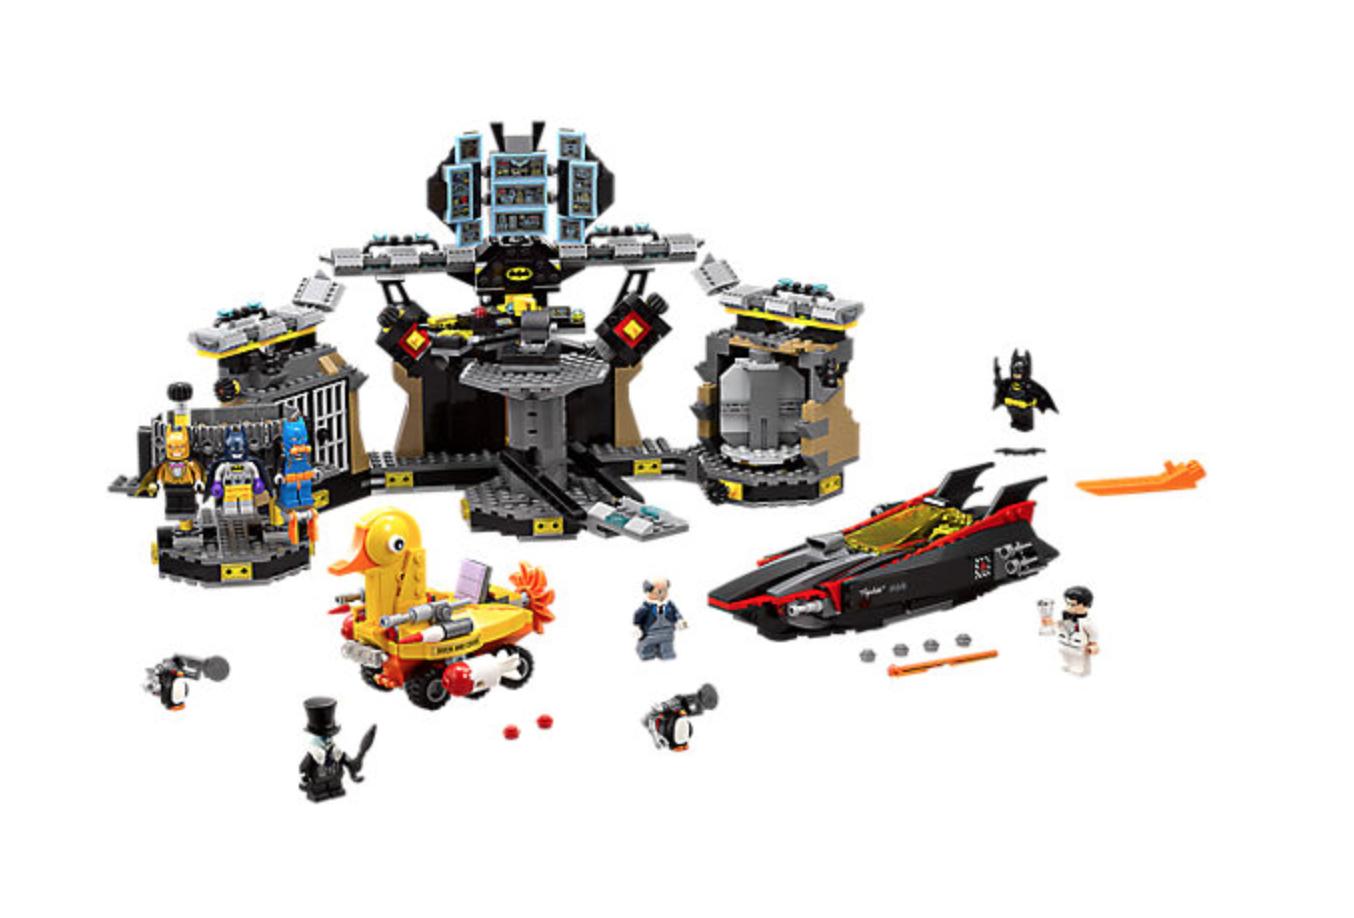 LEGO Batman Movie Batcave Break-In Available On LEGO Shop